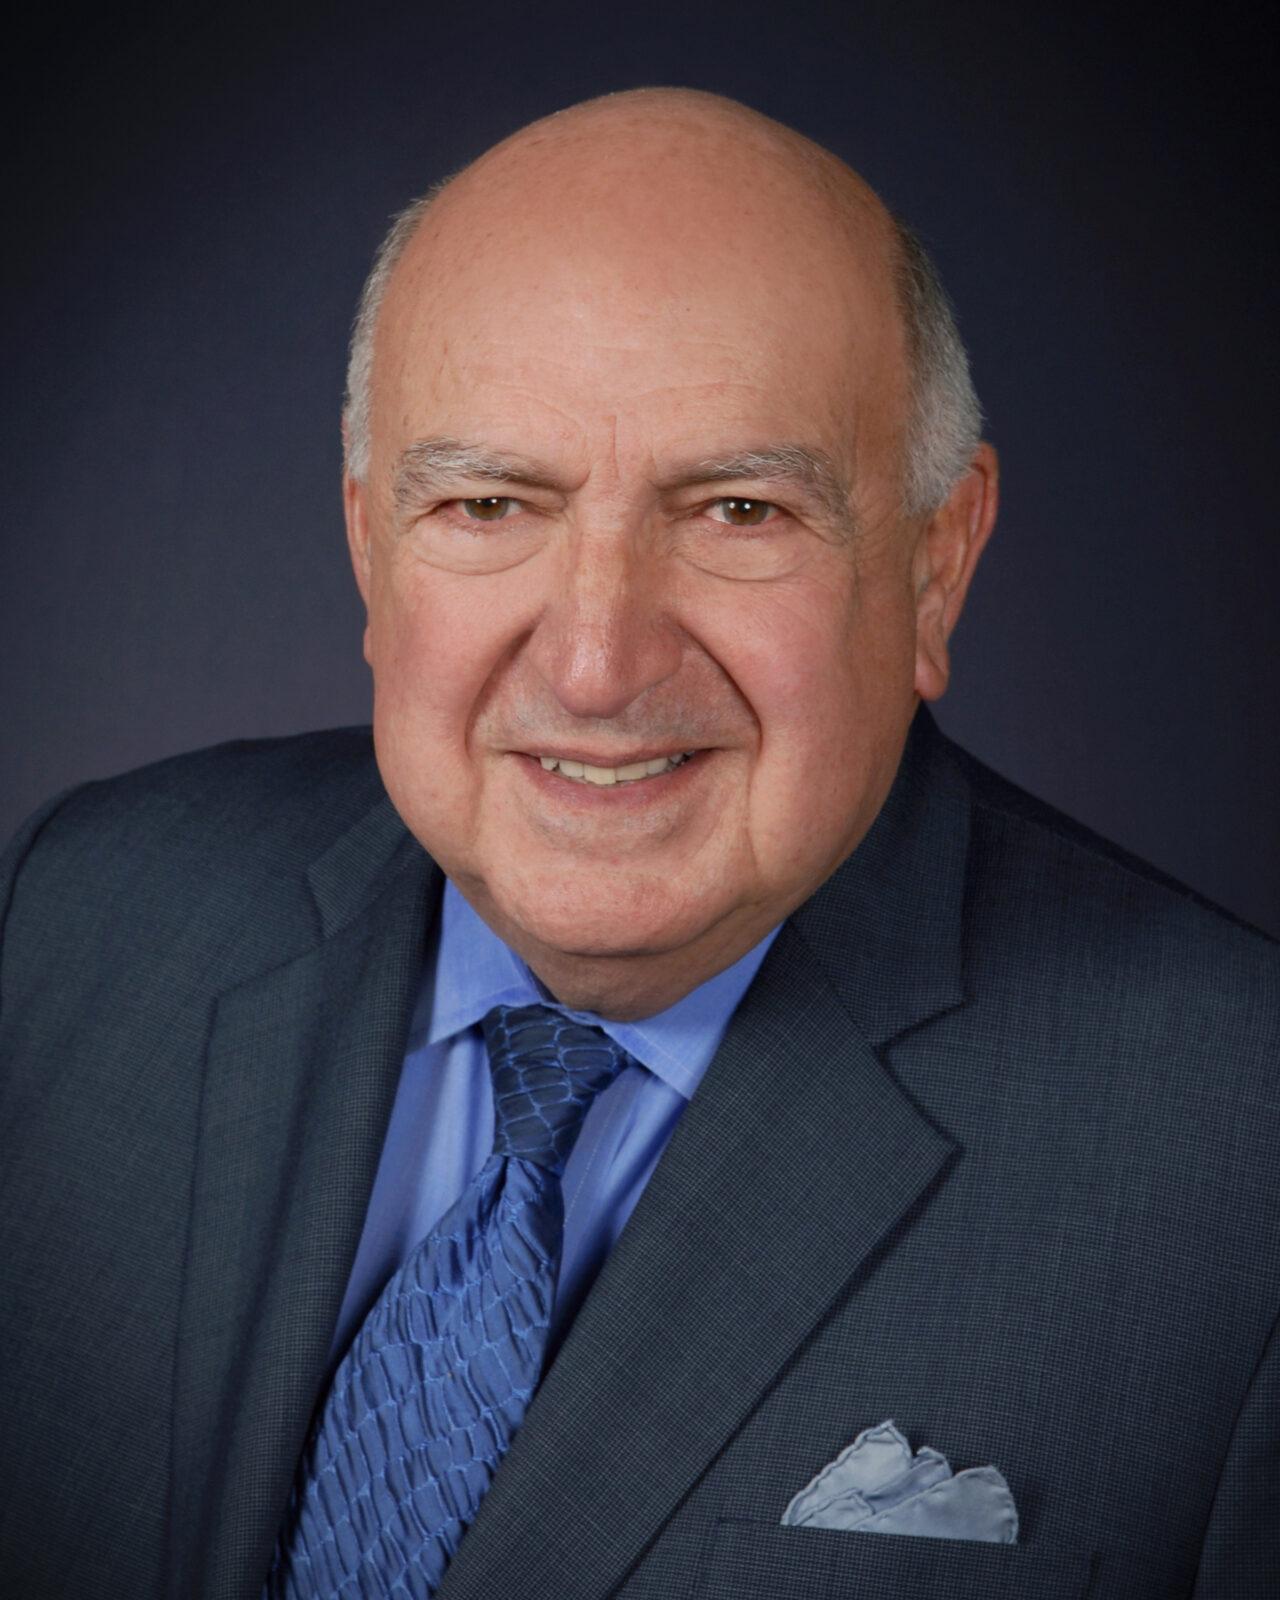 CEO Frank DiBello